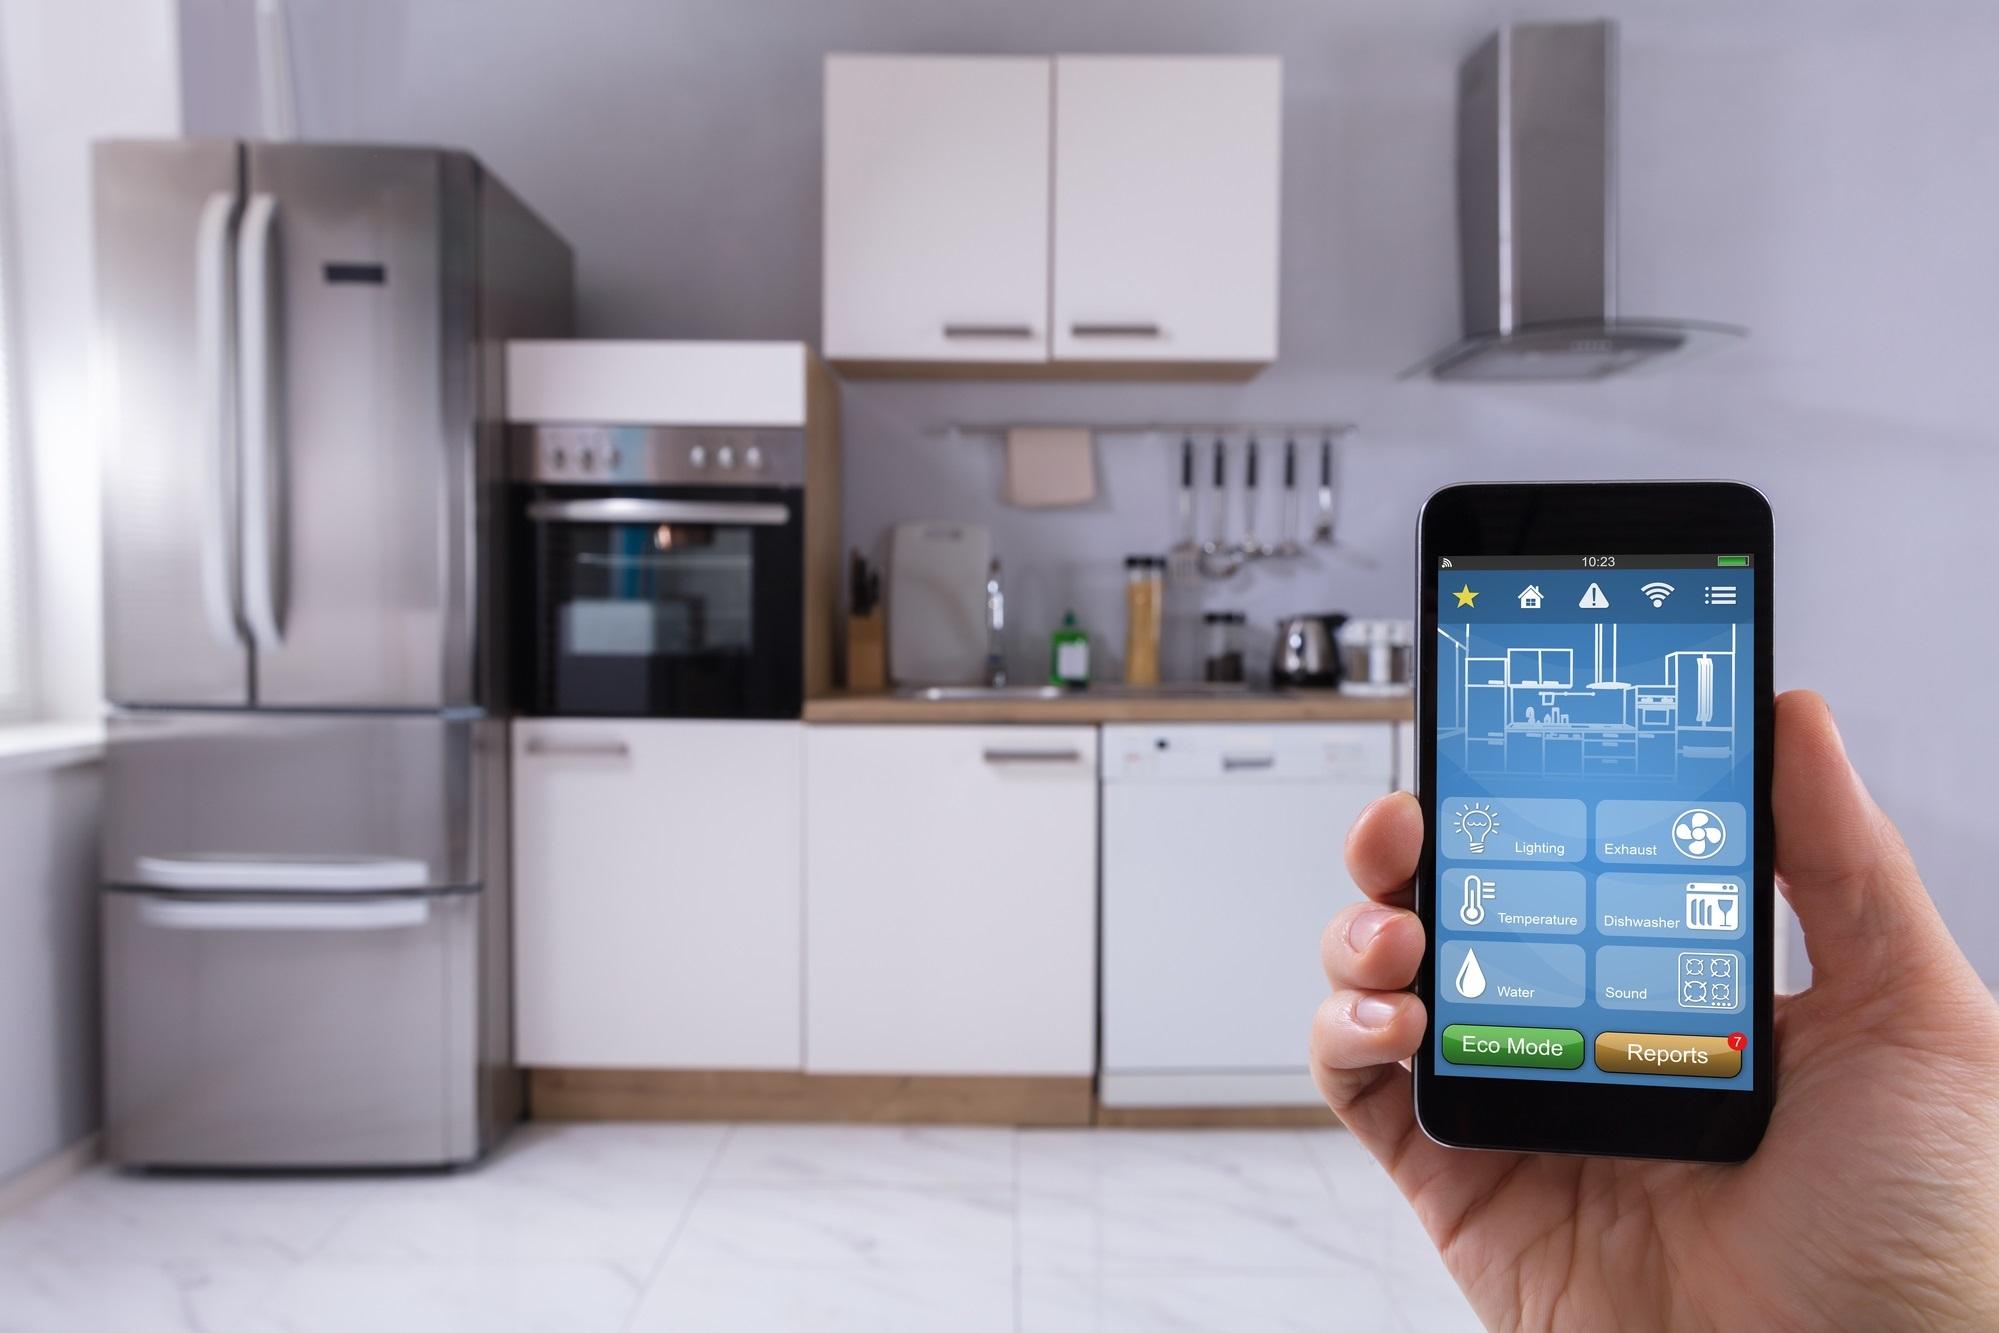 5 trendy kitchen remodeling ideas for 2018 - millard plumbing